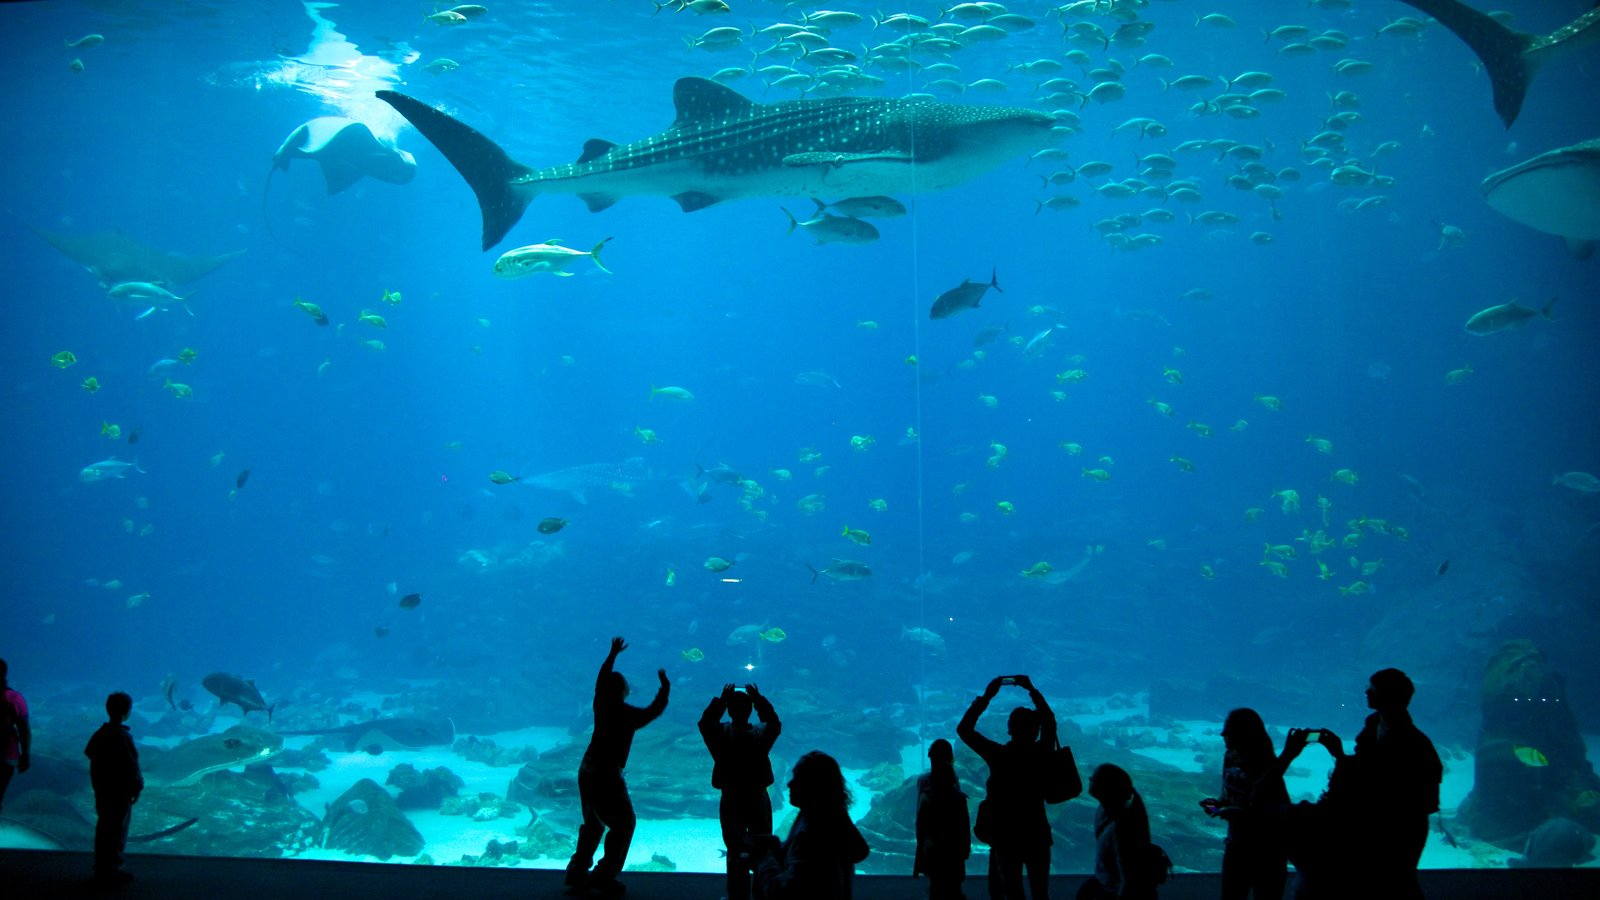 Atlanta featuring interior views and marine life